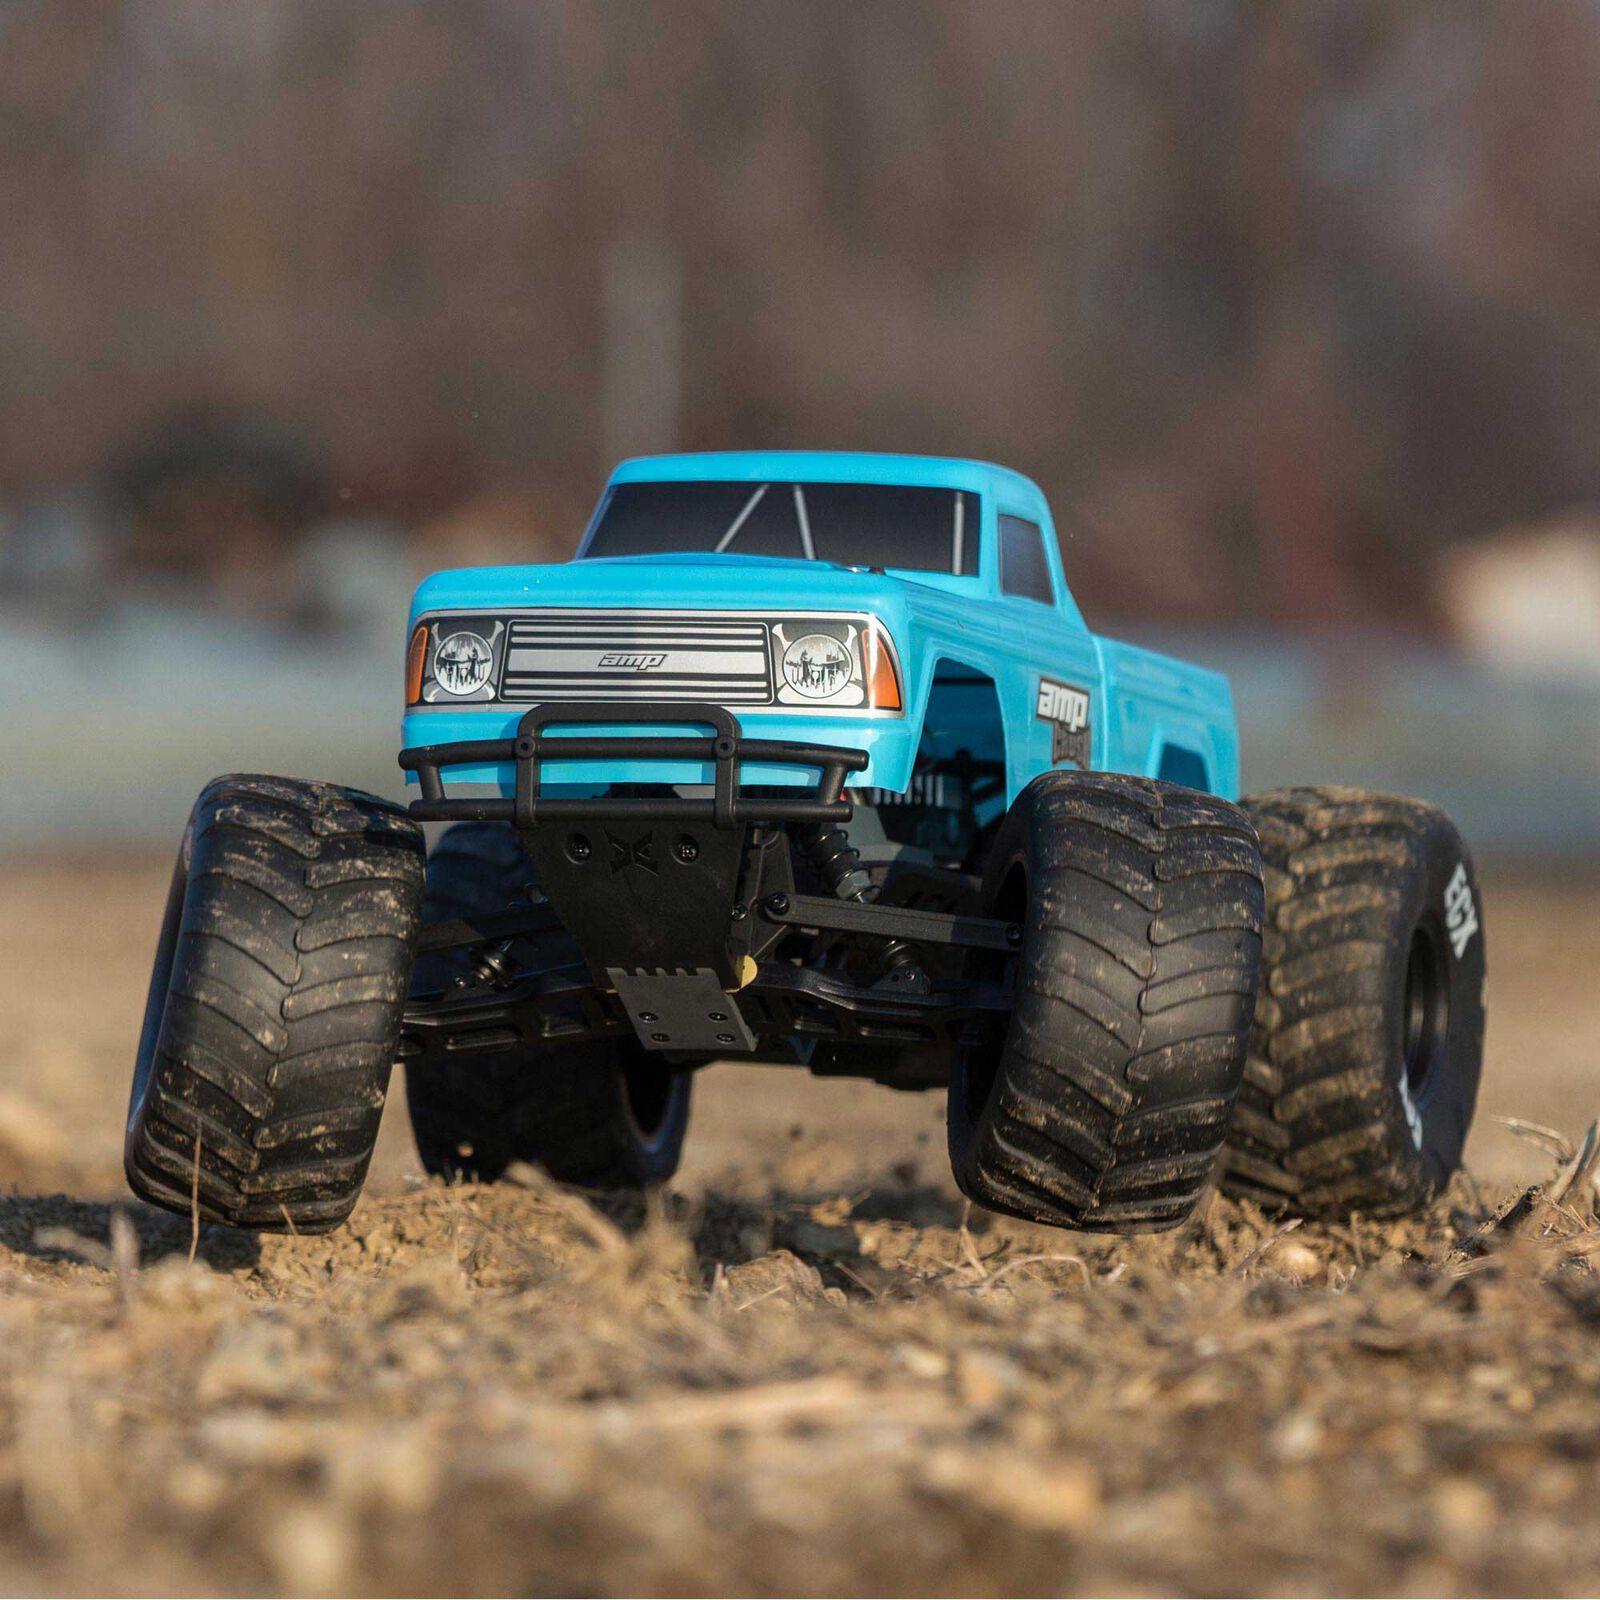 1/10 Amp Crush 2WD Monster Truck Brushed RTR International, Blue